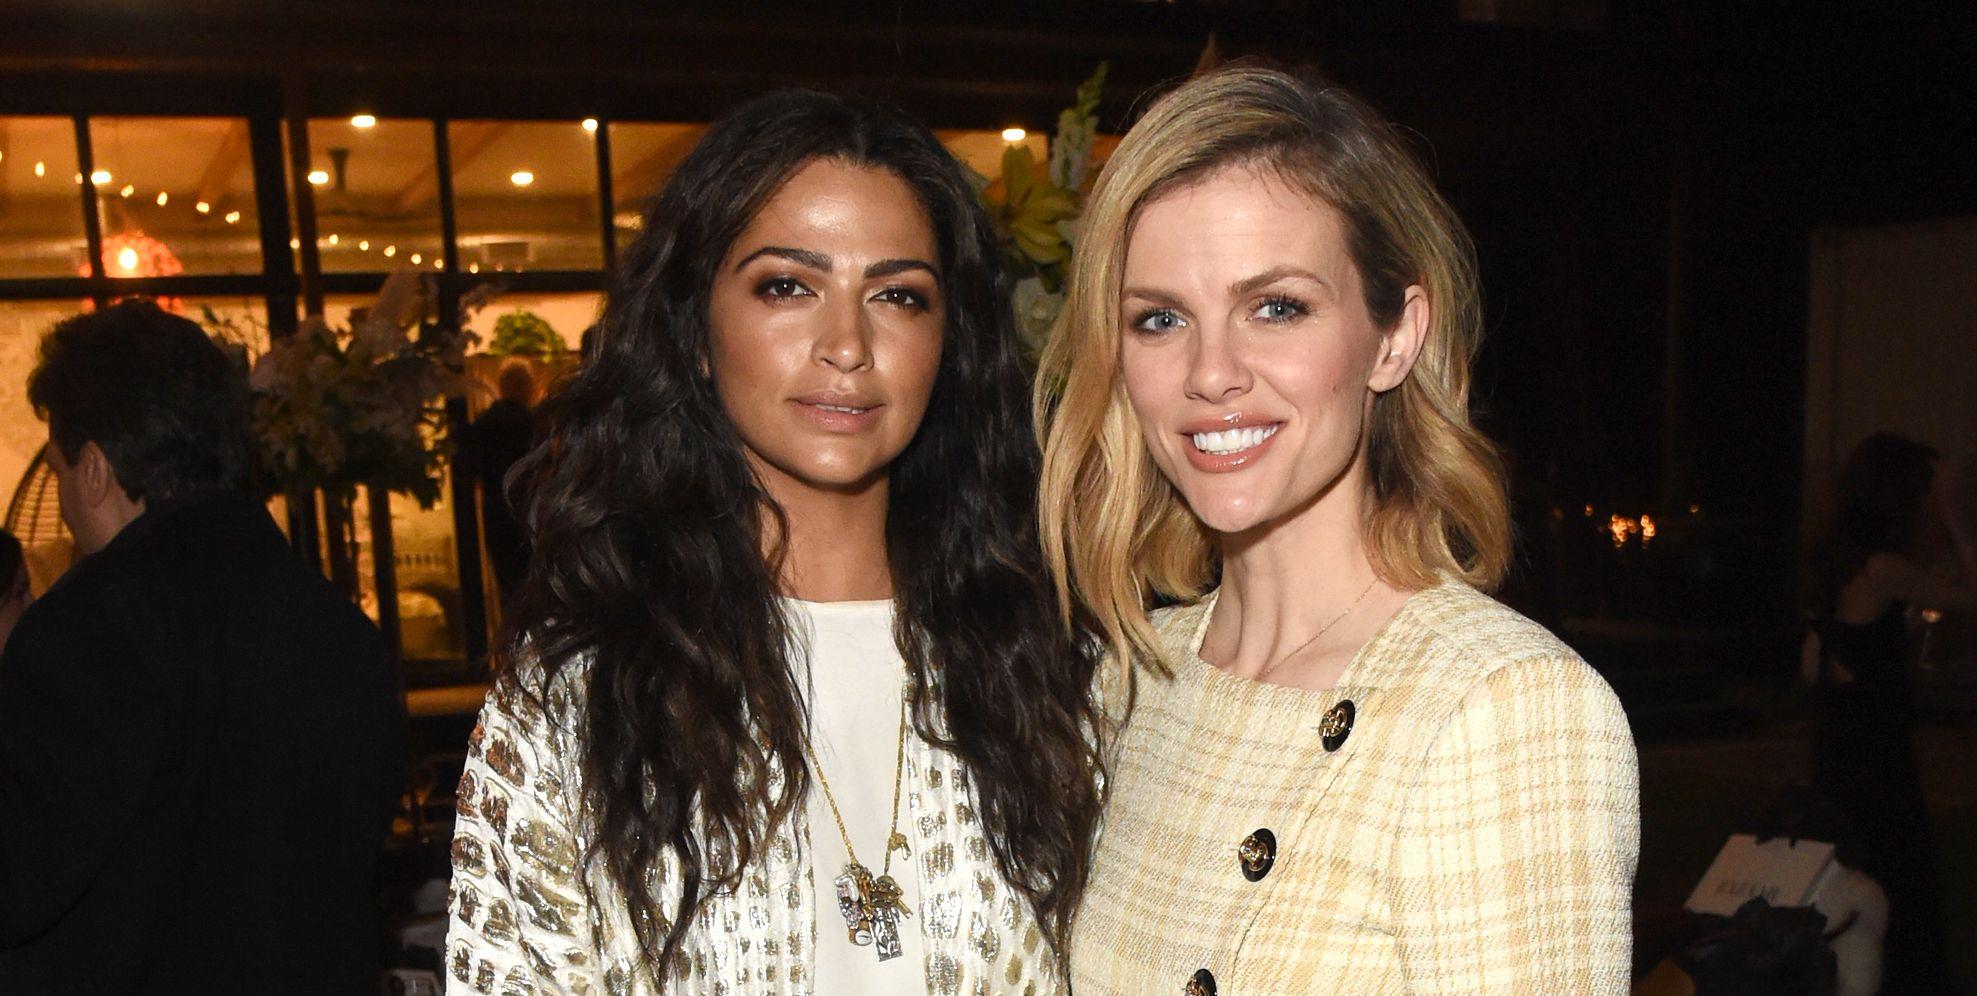 Brooklyn Decker & Camila Alves McConaughey Step Out to Celebrate International Women's Day